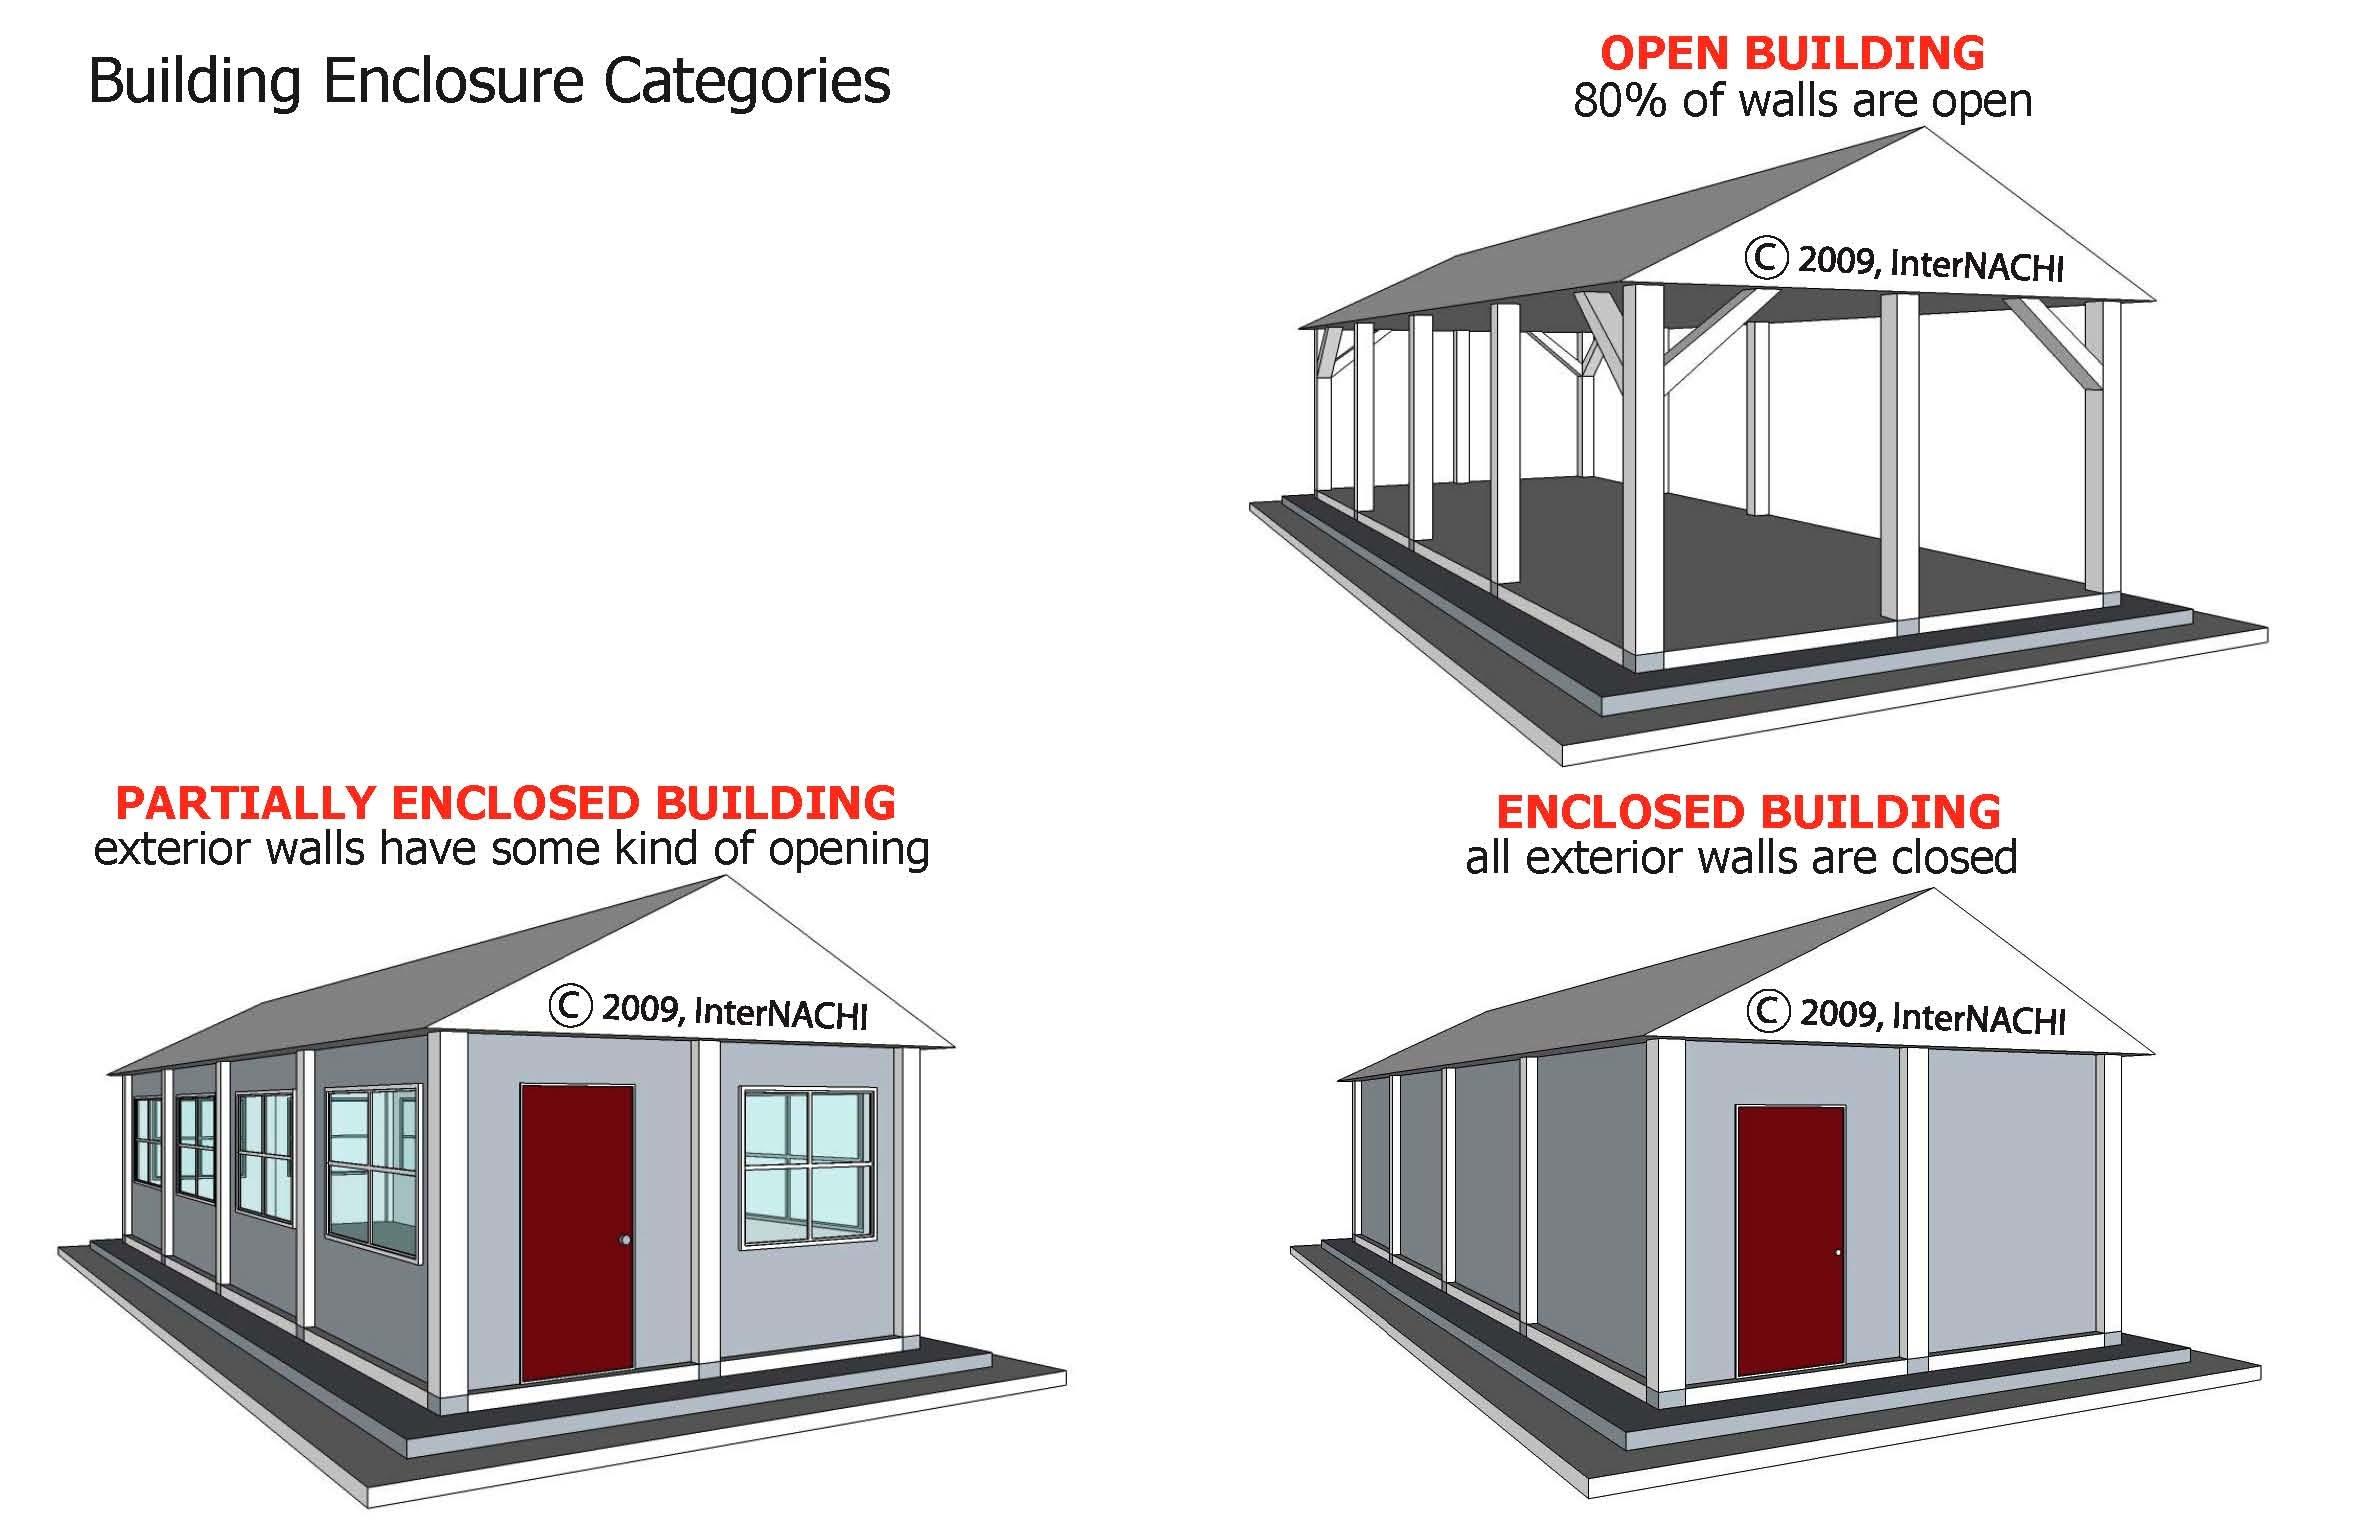 Building enclosure categories.